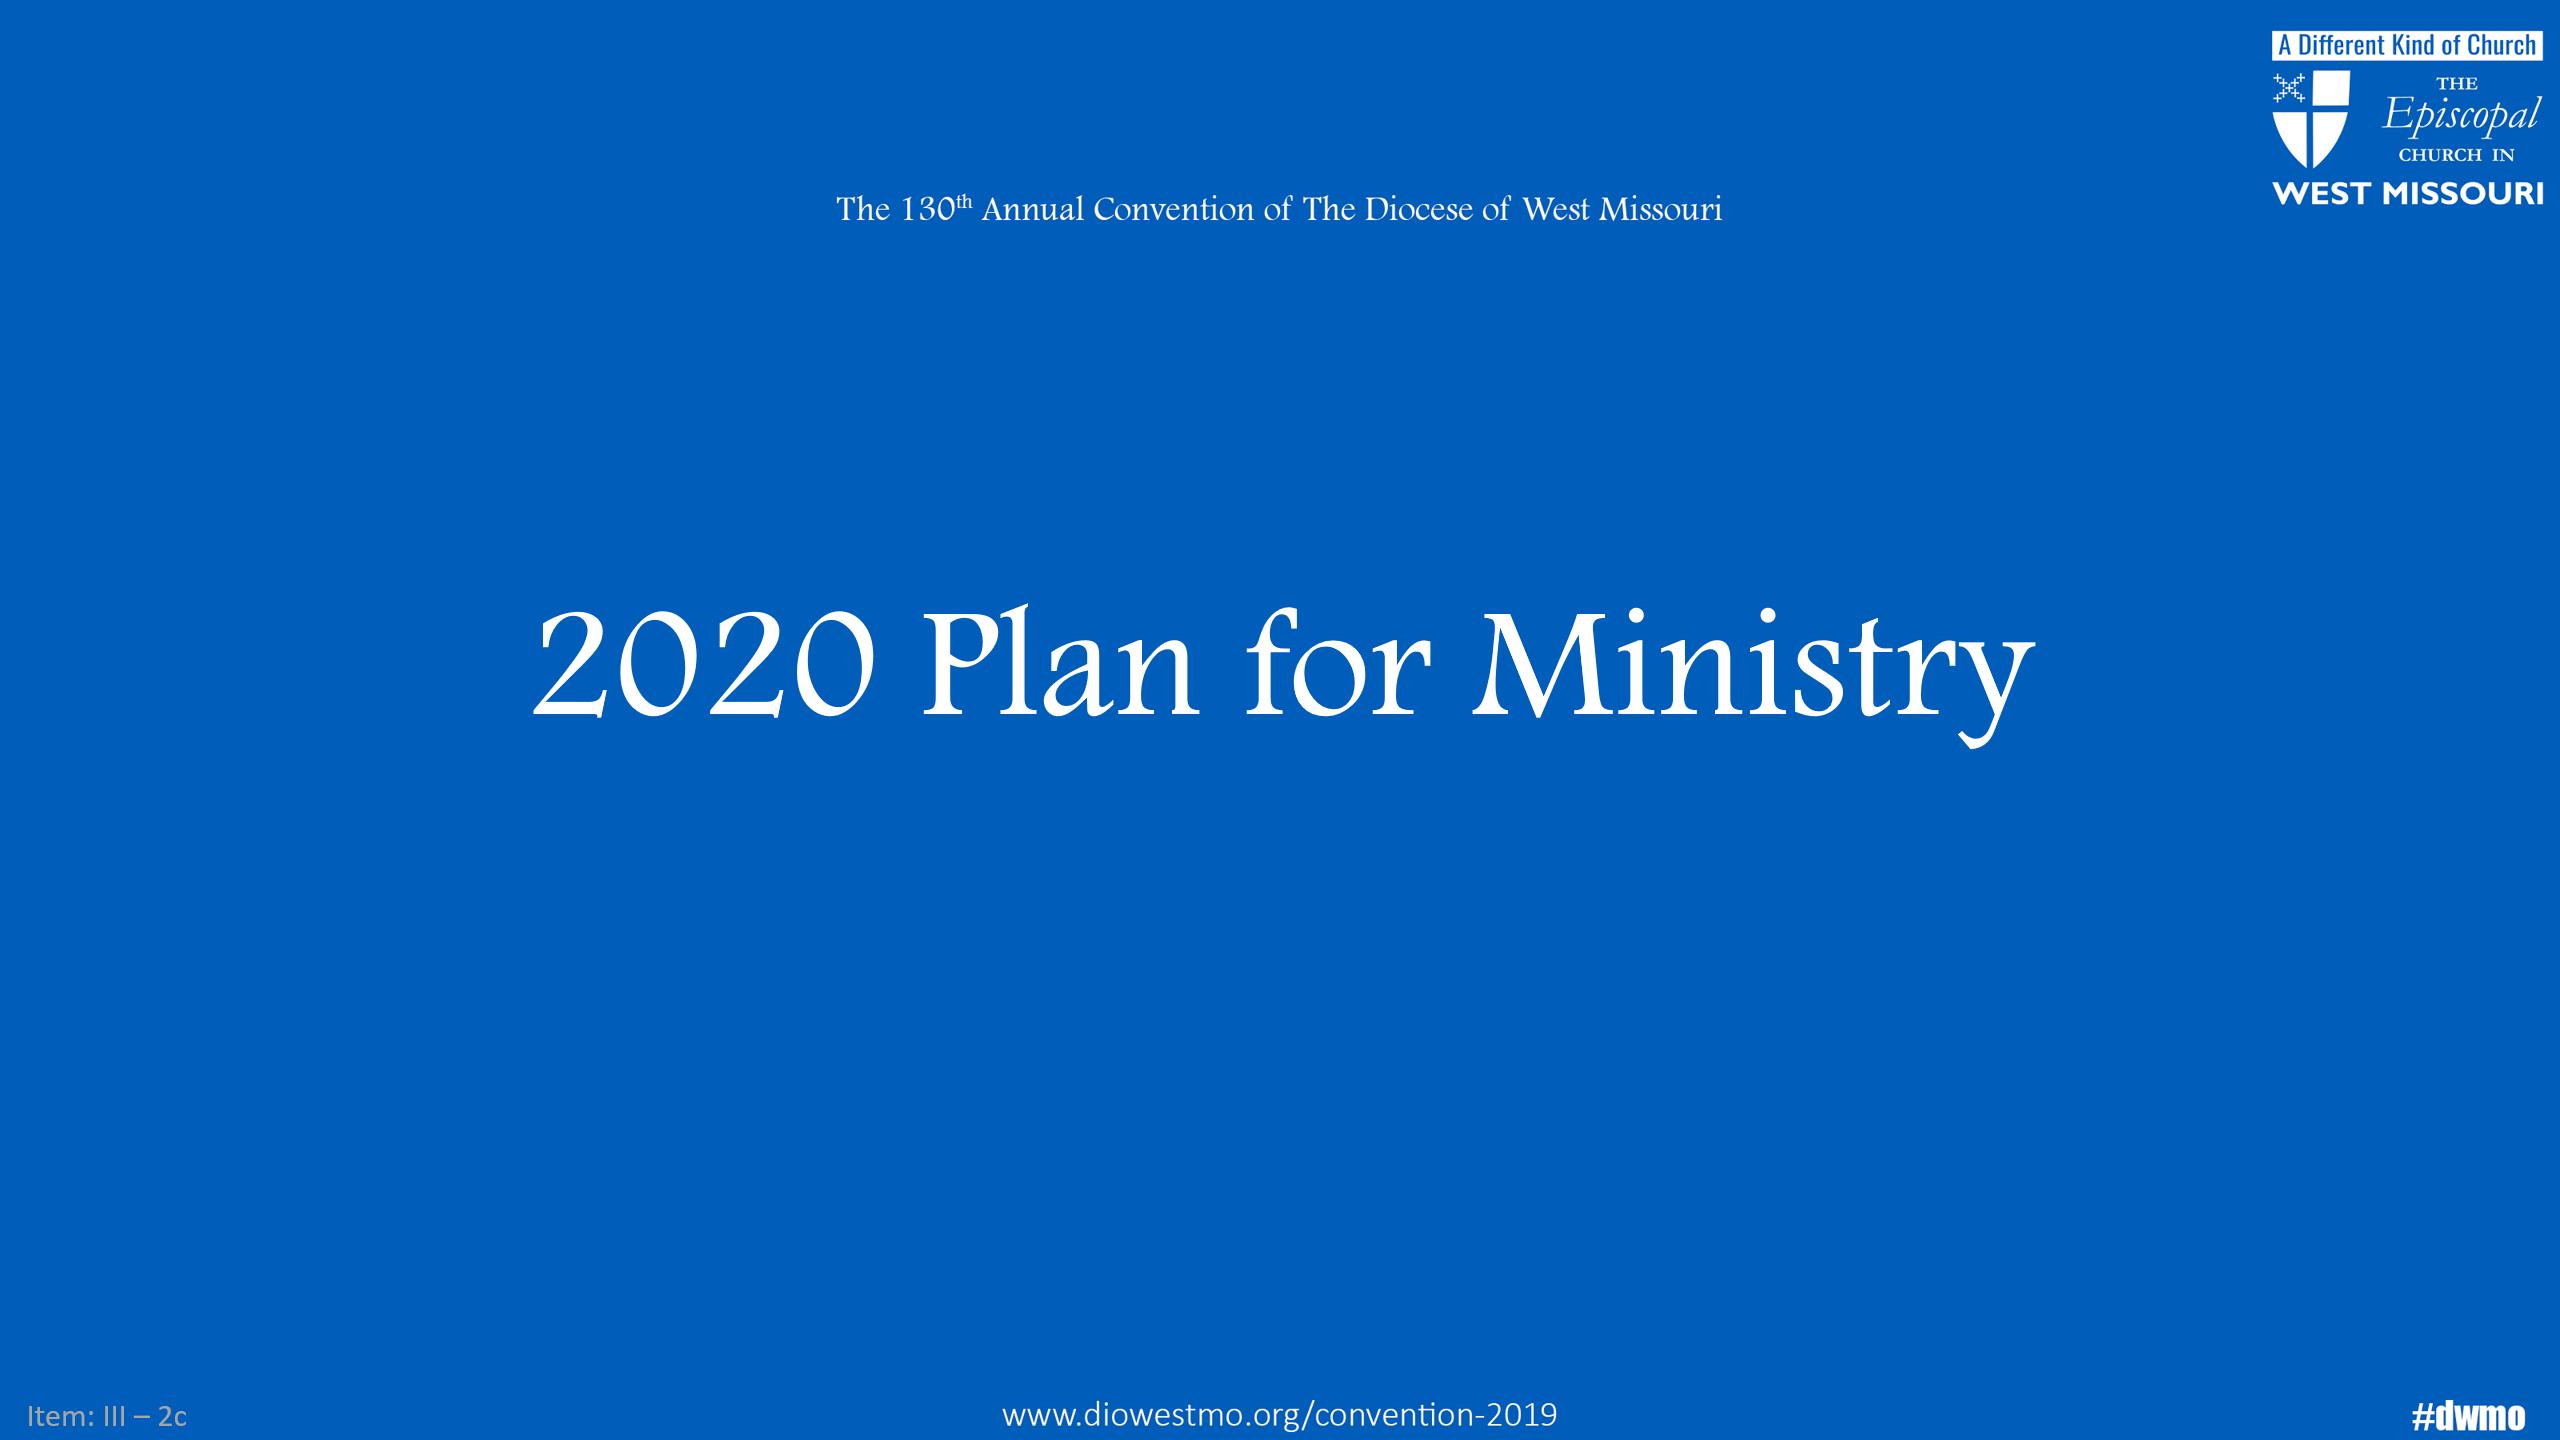 2020 Plan for Ministry Presentation Slides